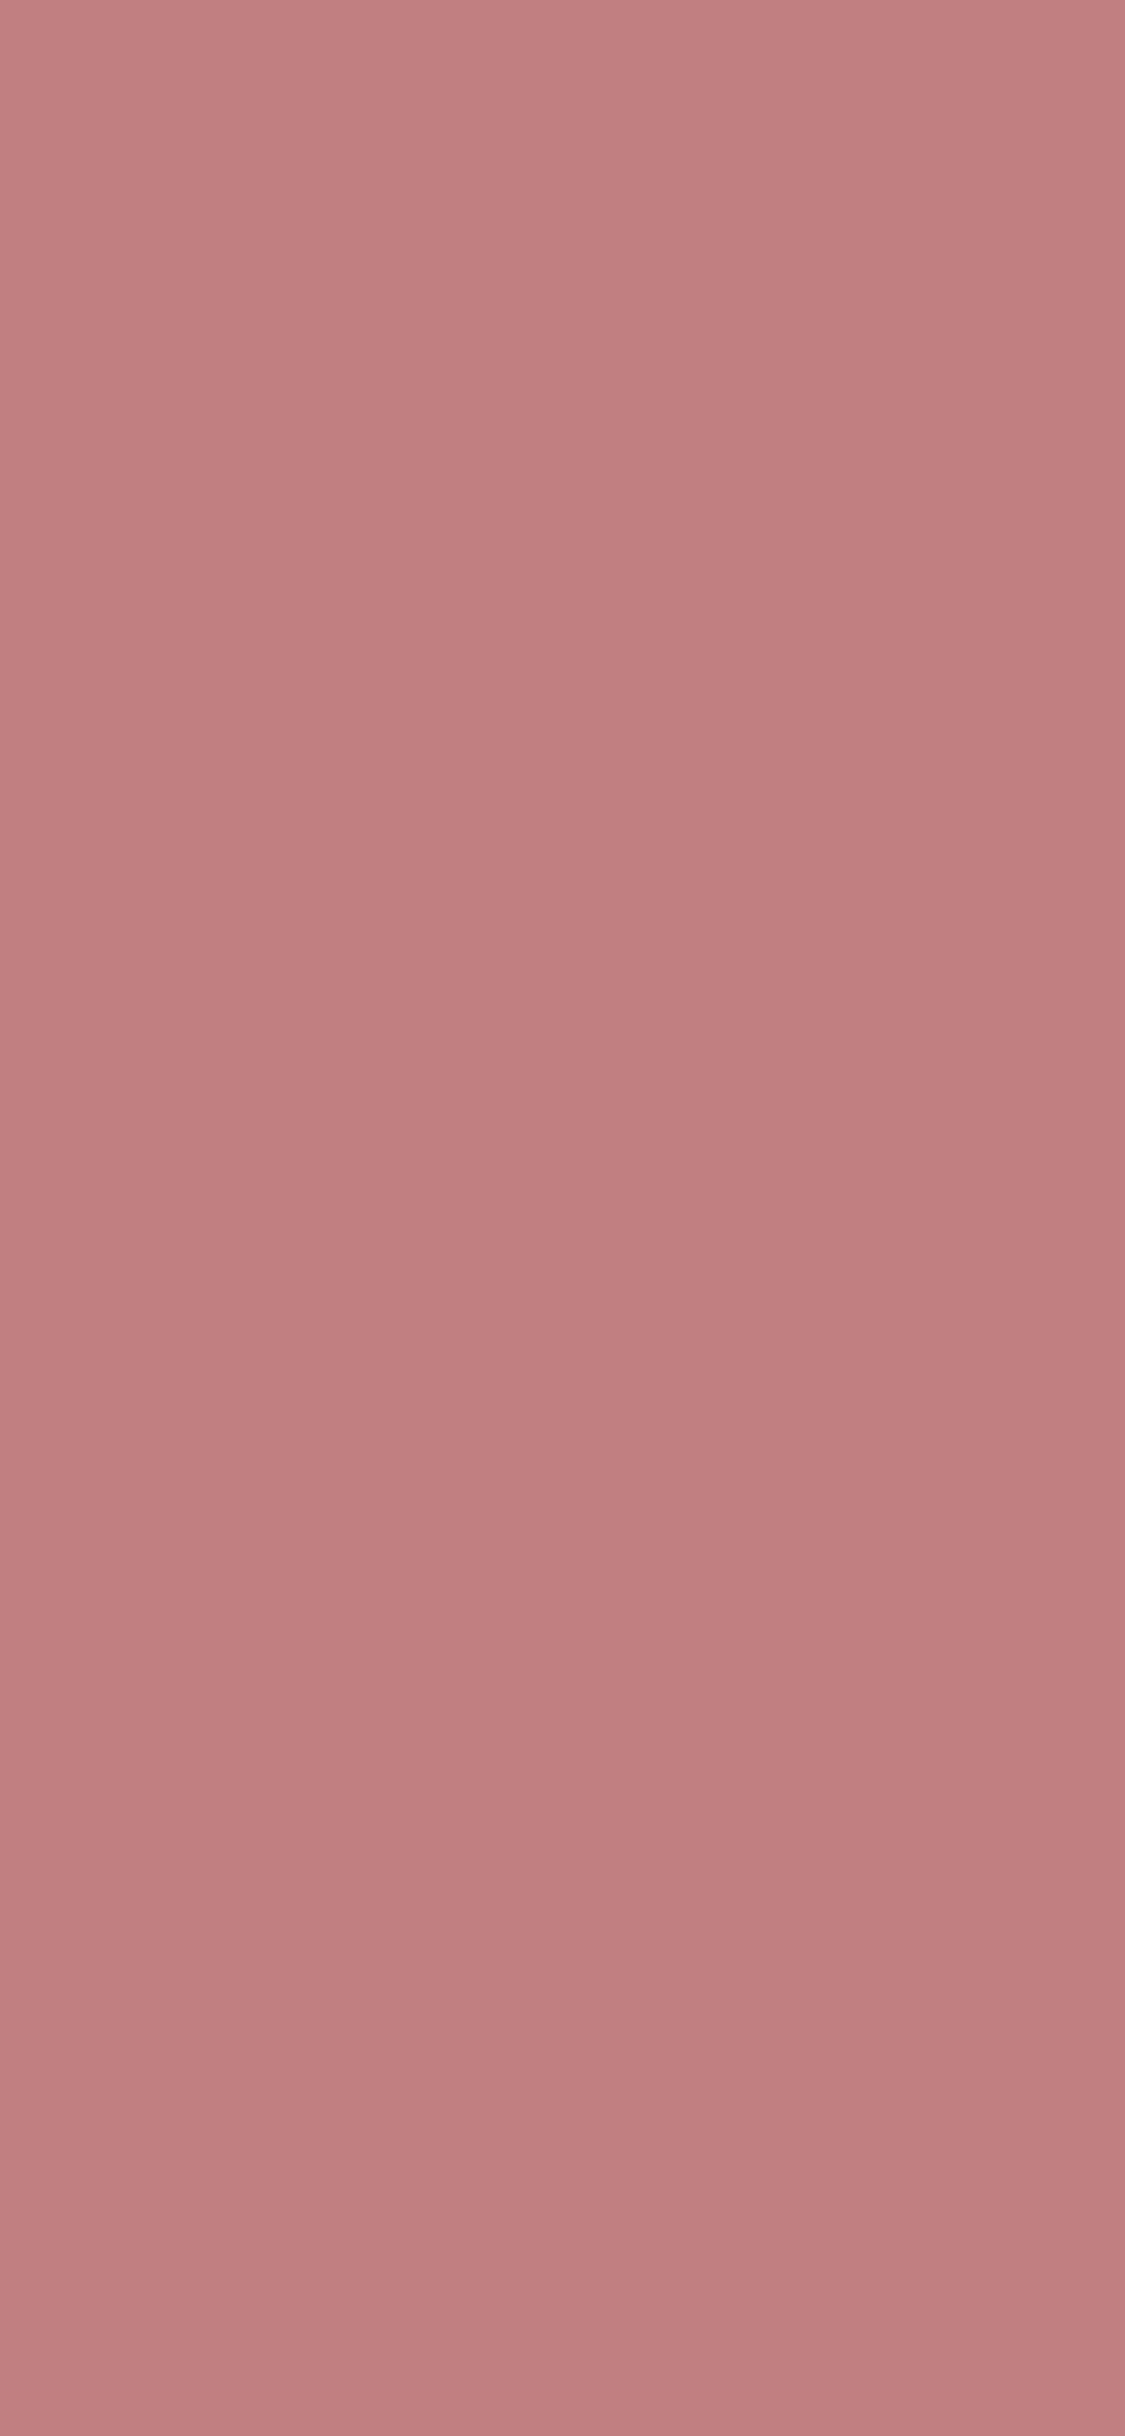 1125x2436 Old Rose Solid Color Background